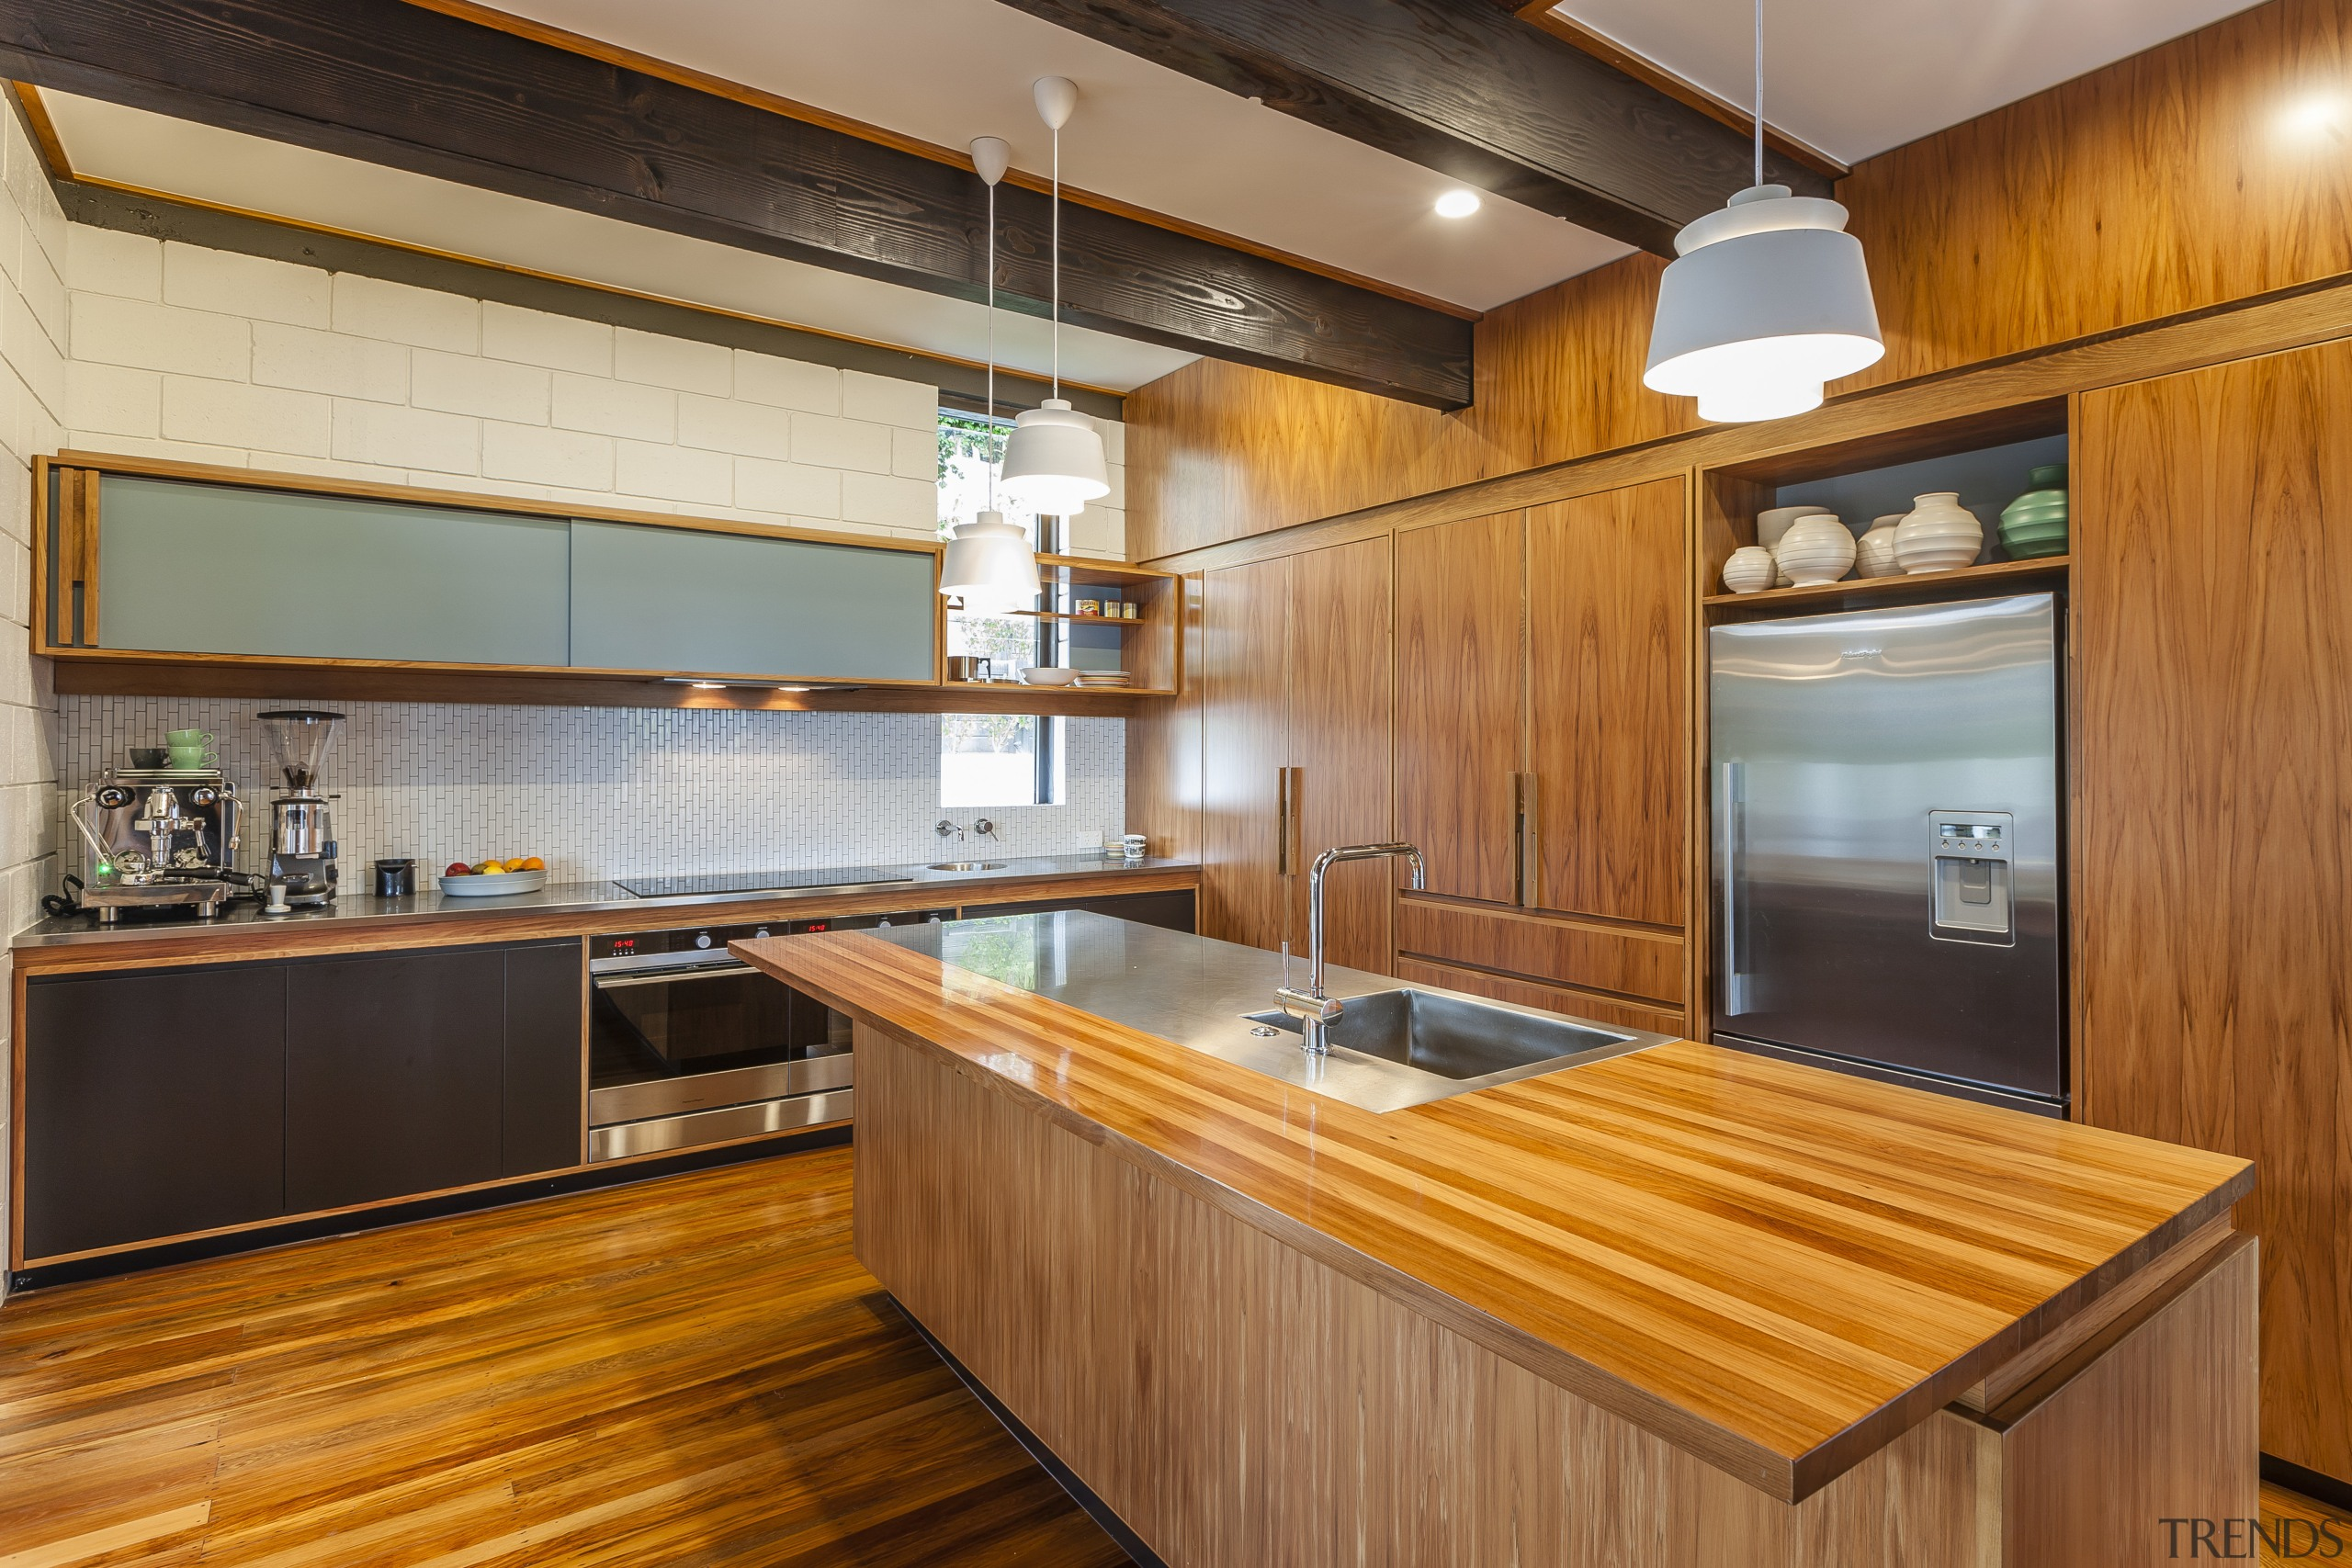 Veneer heart rimu cabinetry is combined with teal cabinetry, countertop, cuisine classique, hardwood, interior design, kitchen, real estate, room, wood, orange, brown